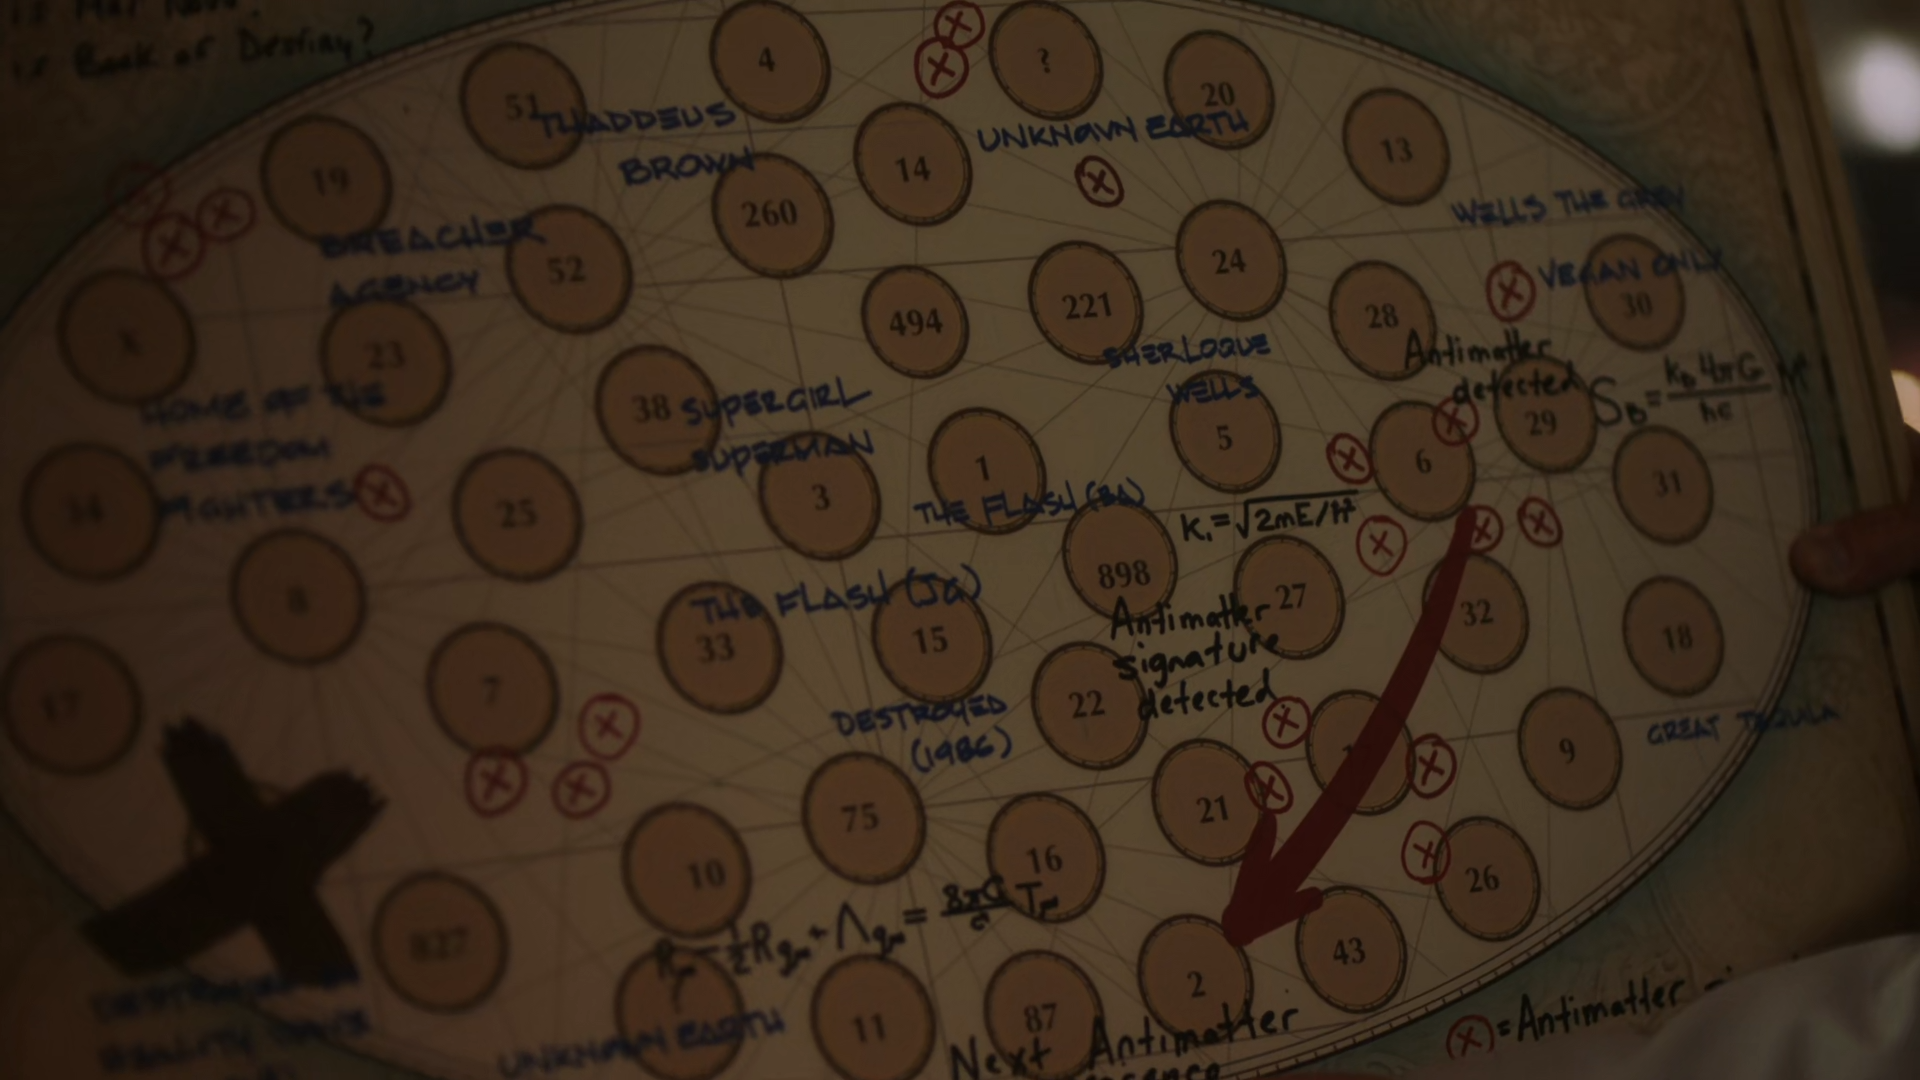 Arrowverse map 001.png